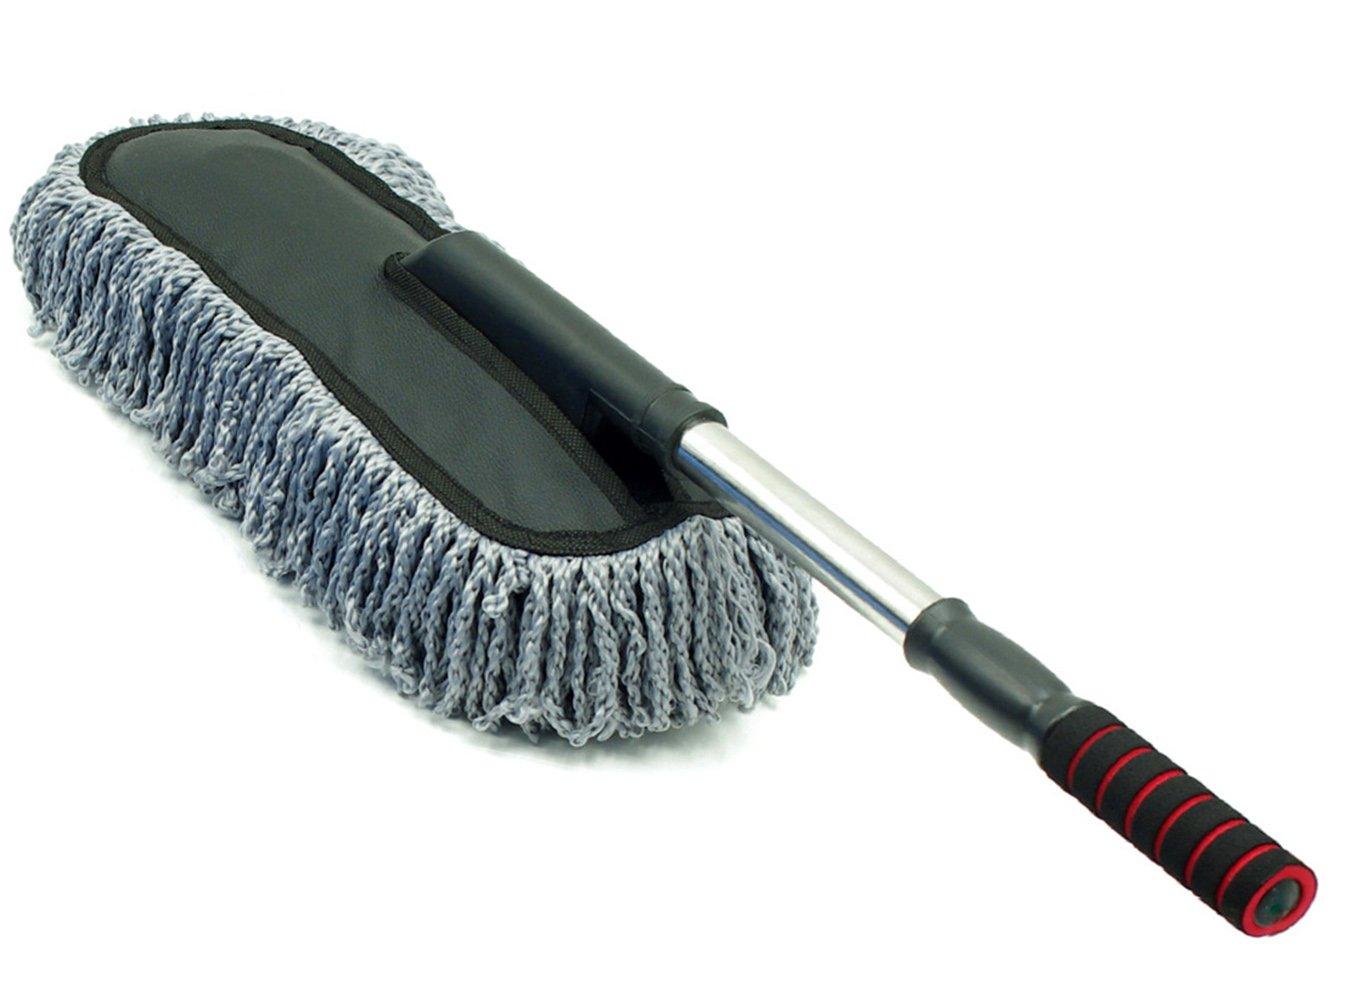 Wenwan mango largo retrá ctil lavado de coches fregona cepillo de coche cepillo de cera de microfibra plumero coche (azul)